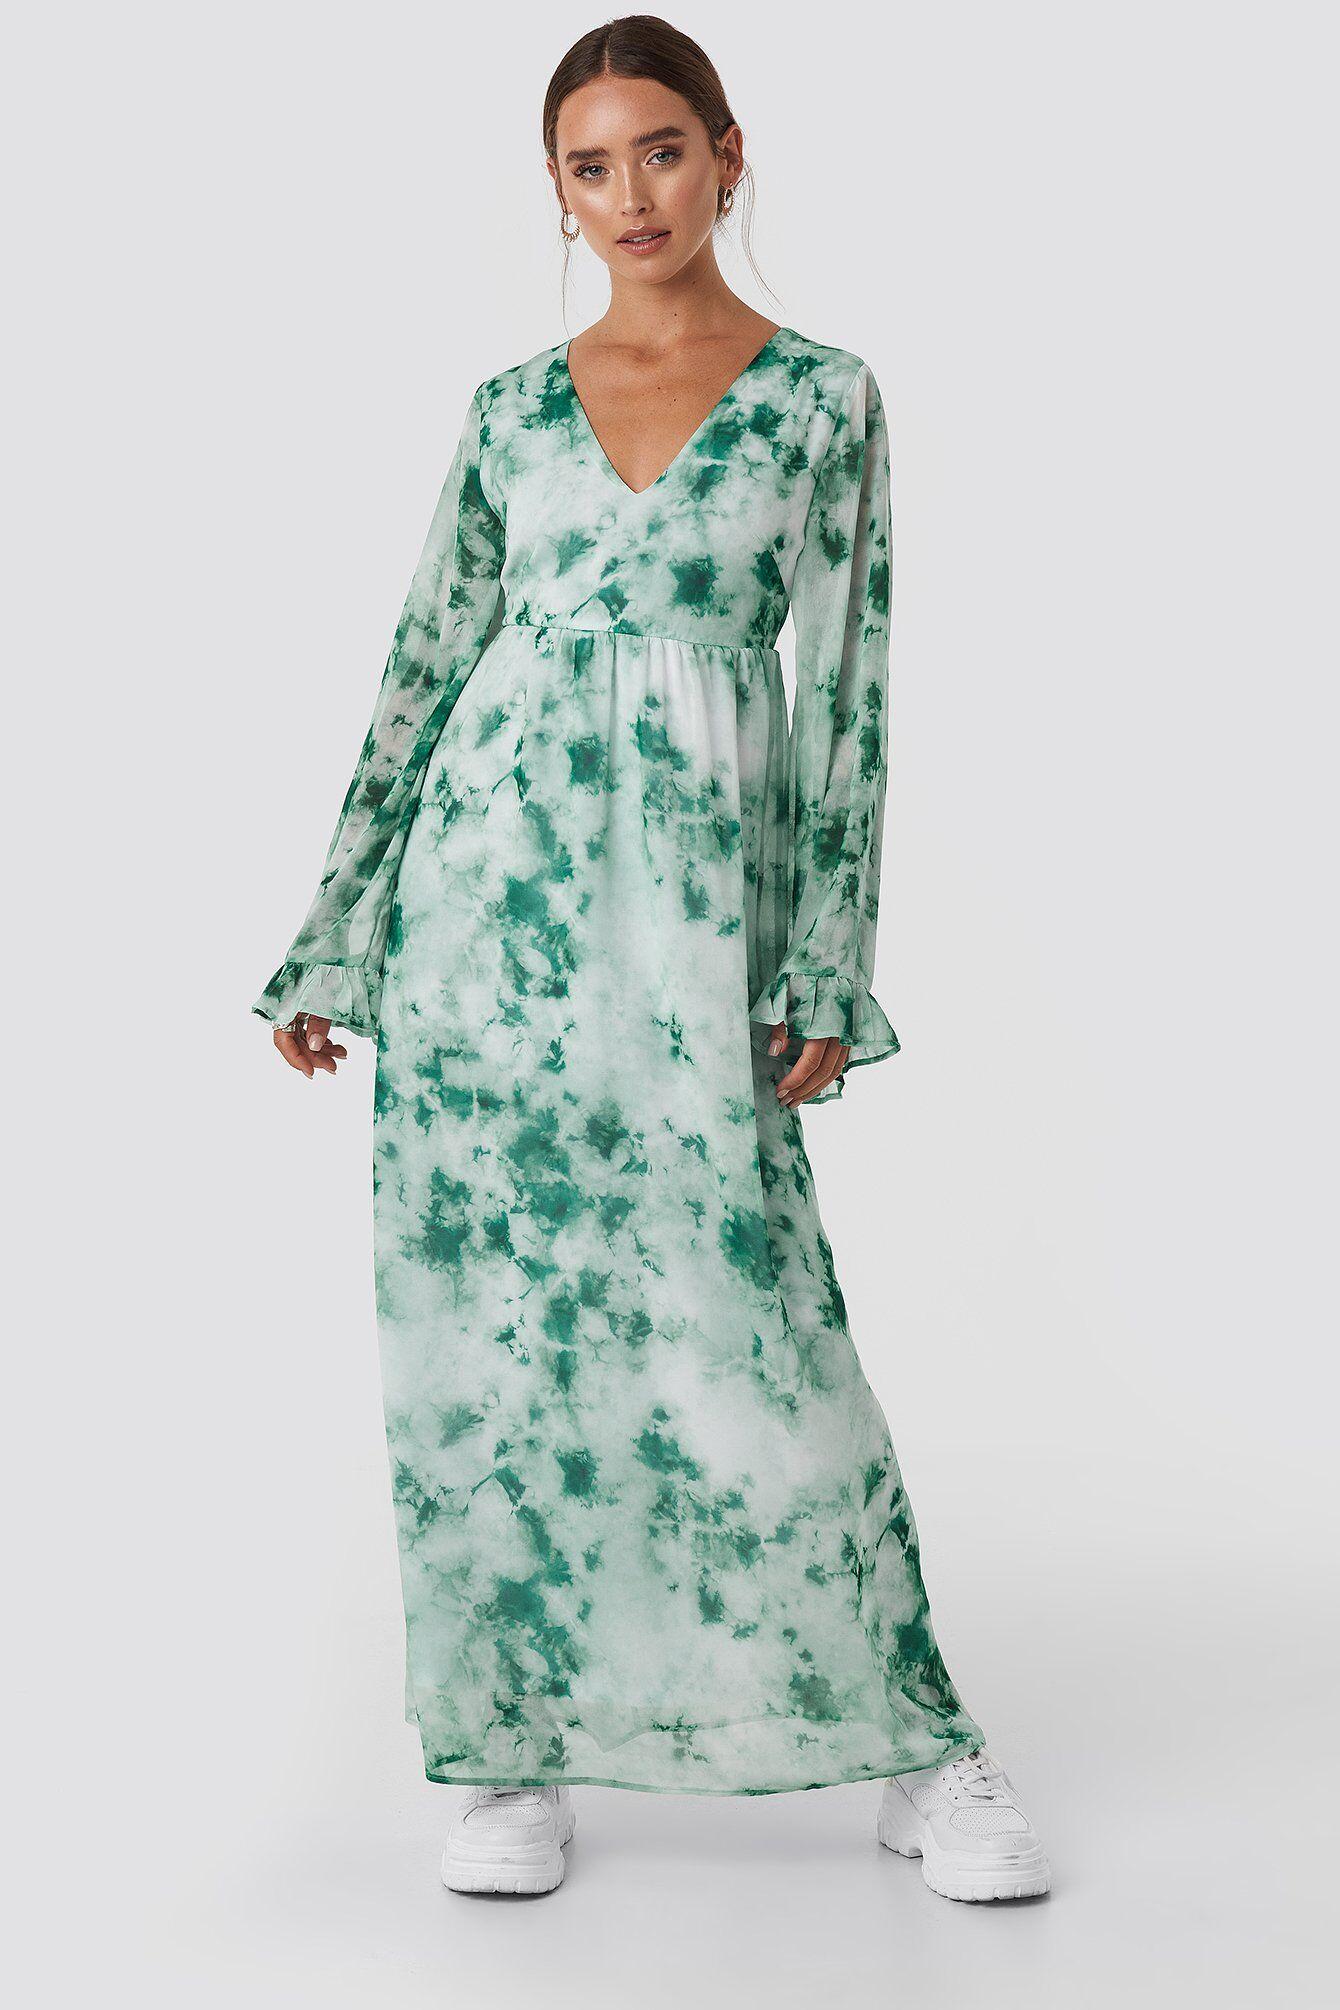 Image of NA-KD Tie Dye Maxi Dress - Green